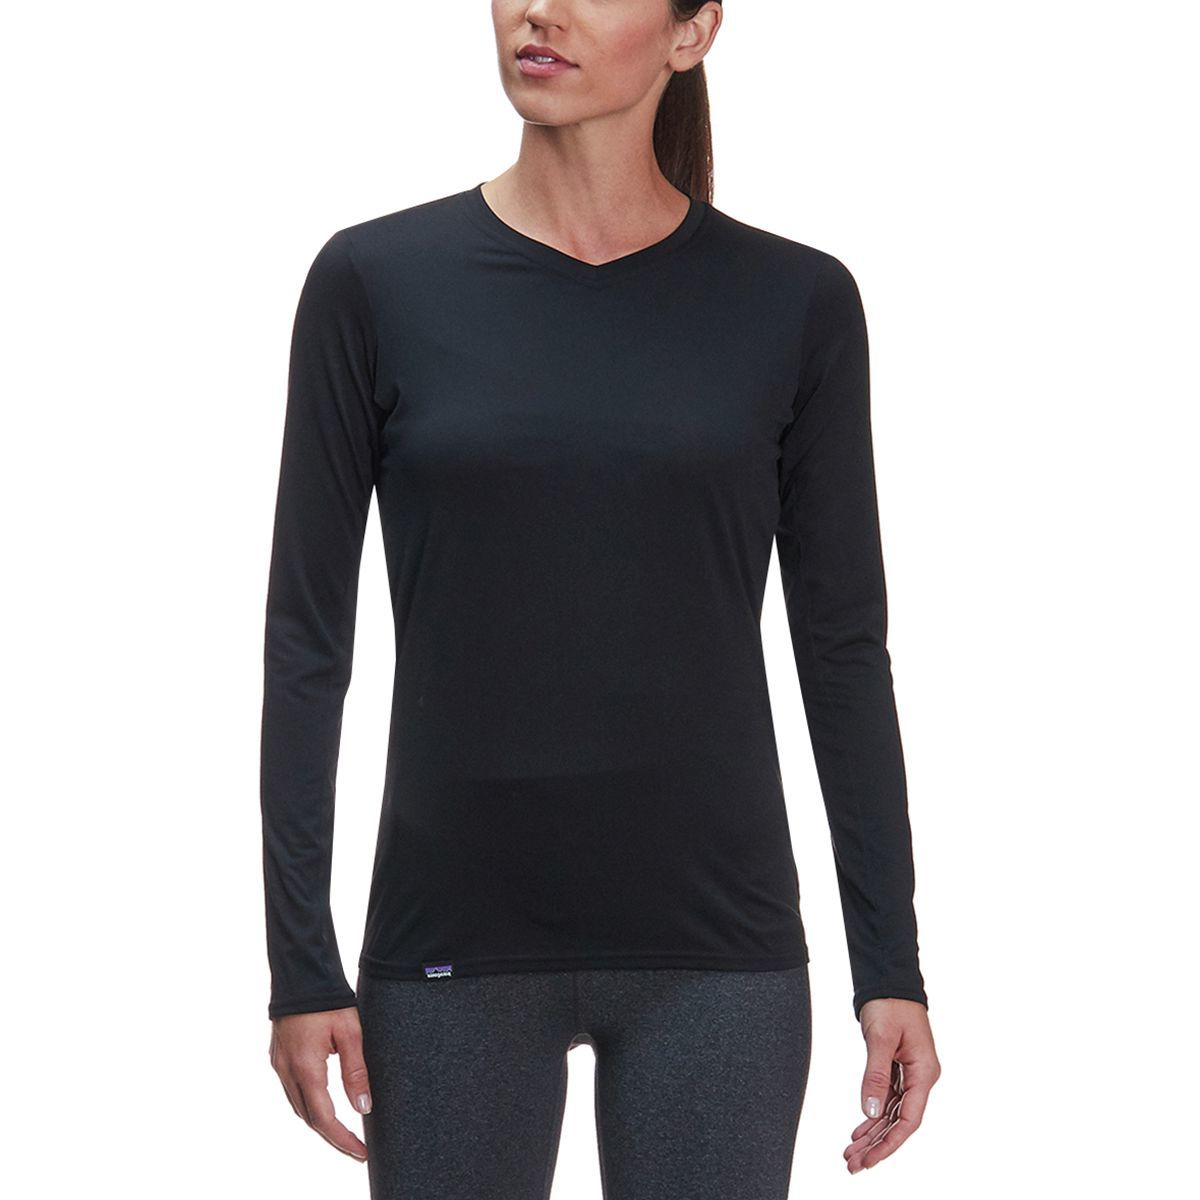 Patagonia Capilene Daily Shirt - Women's